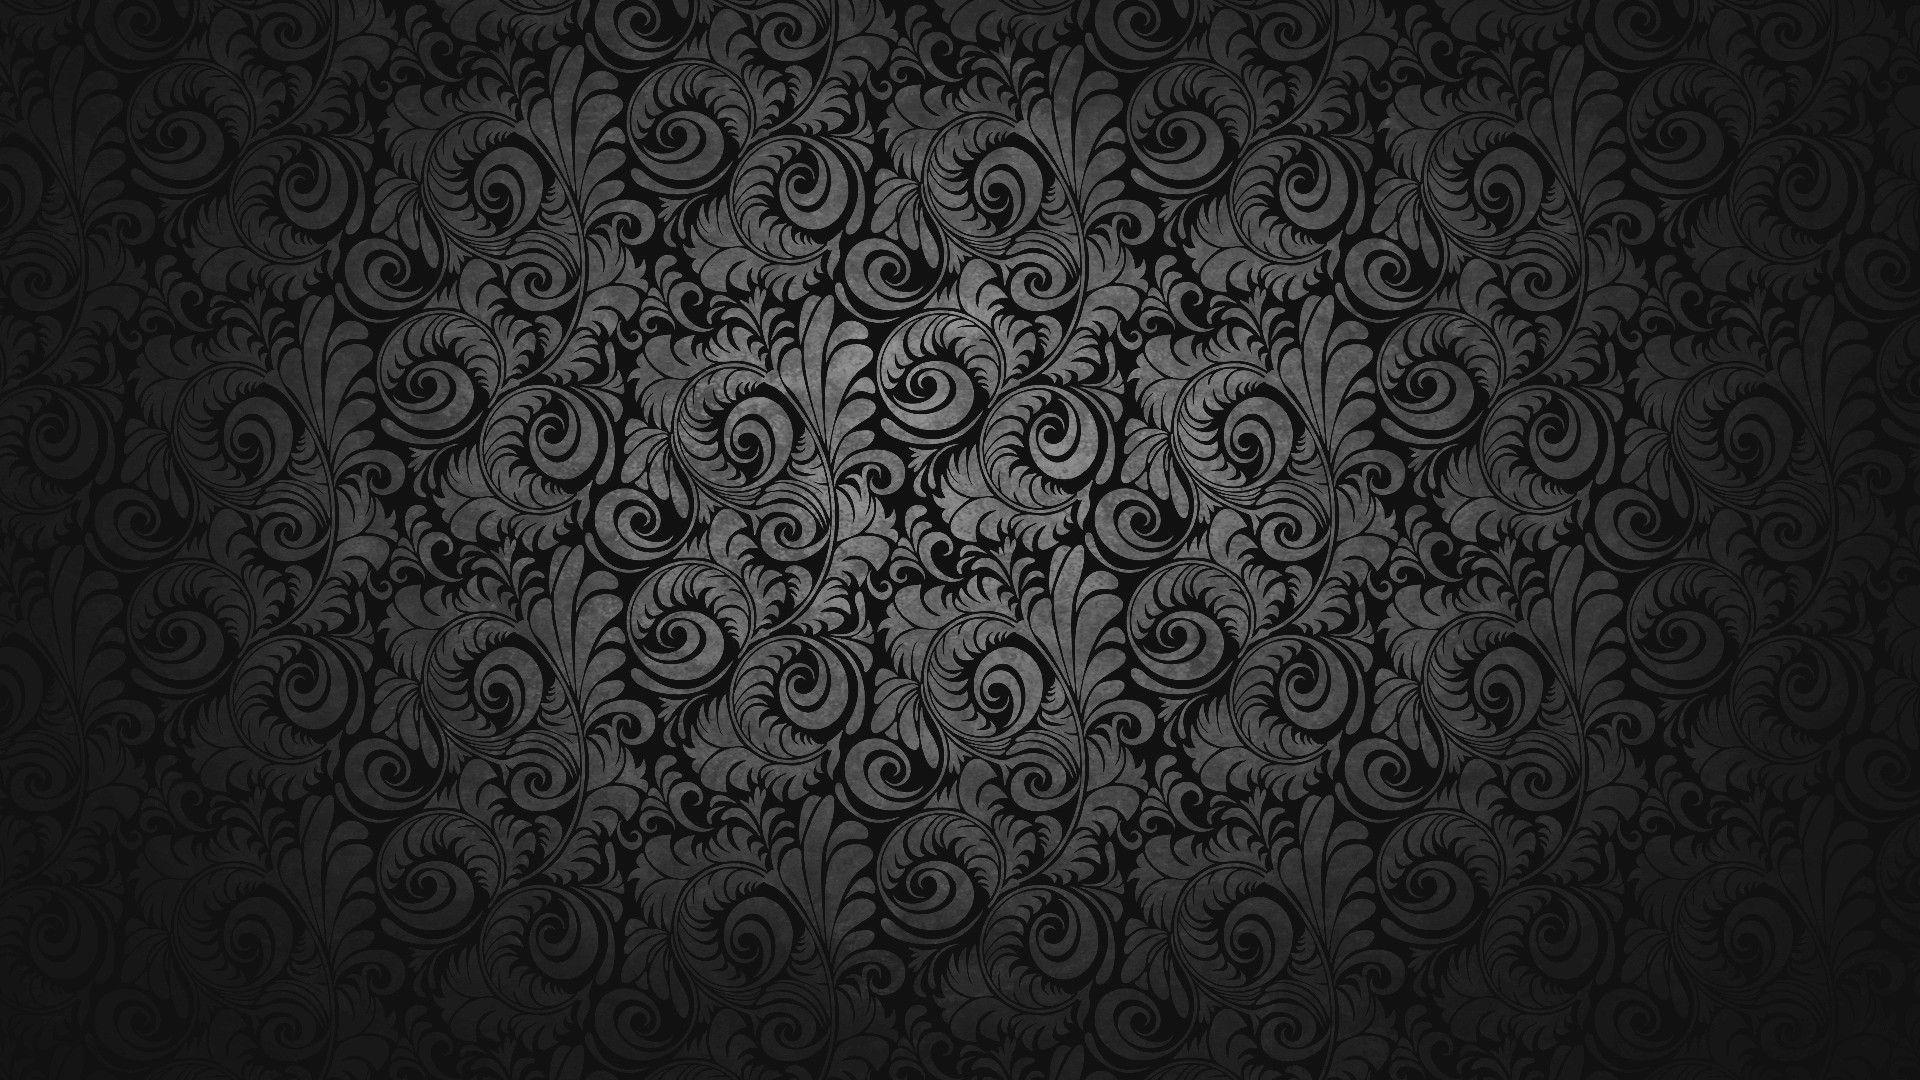 The Latest Black Design Wallpaper